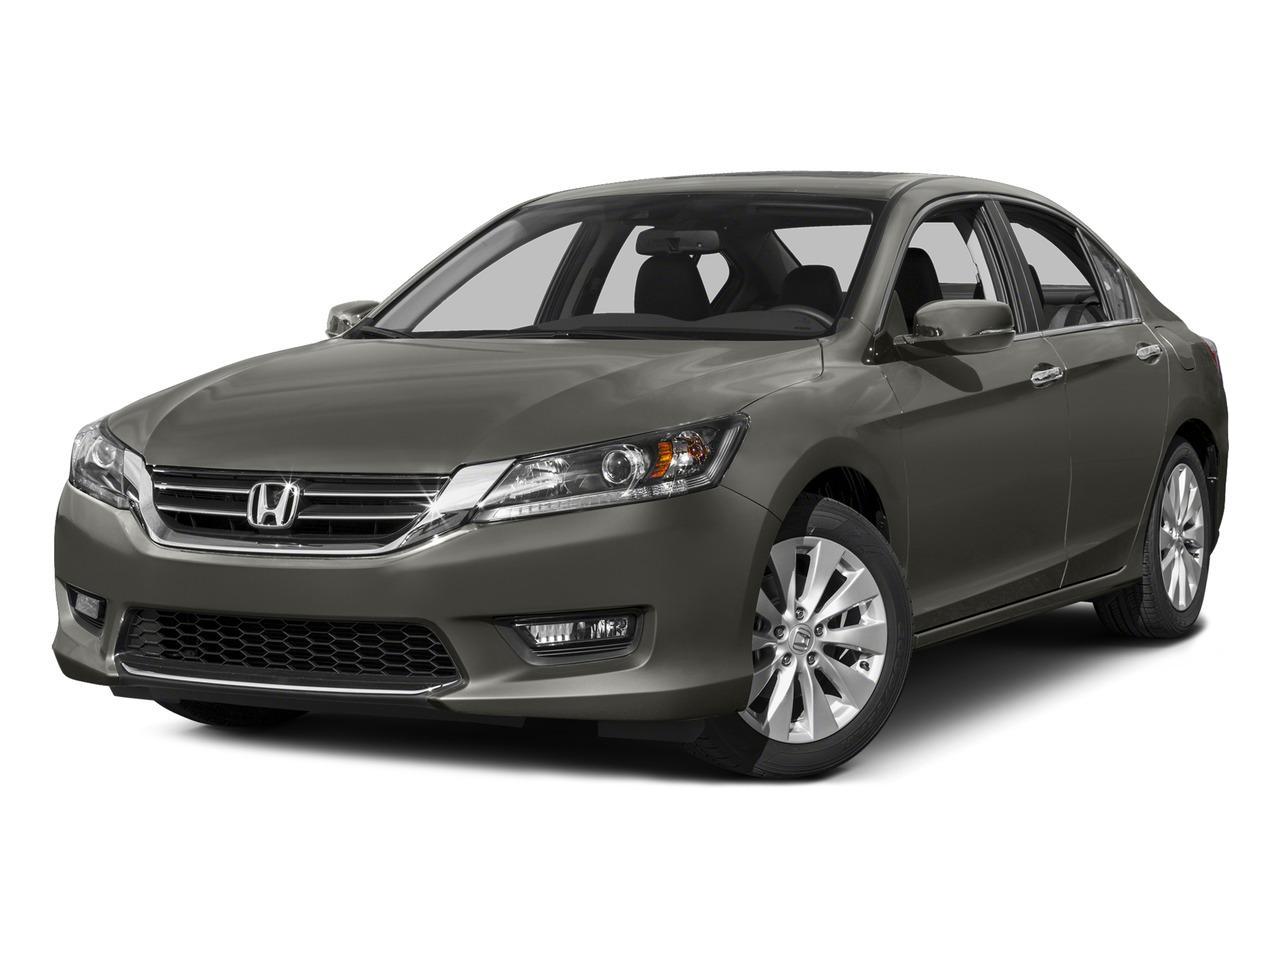 2015 Honda Accord Sedan Vehicle Photo in Tucson, AZ 85705